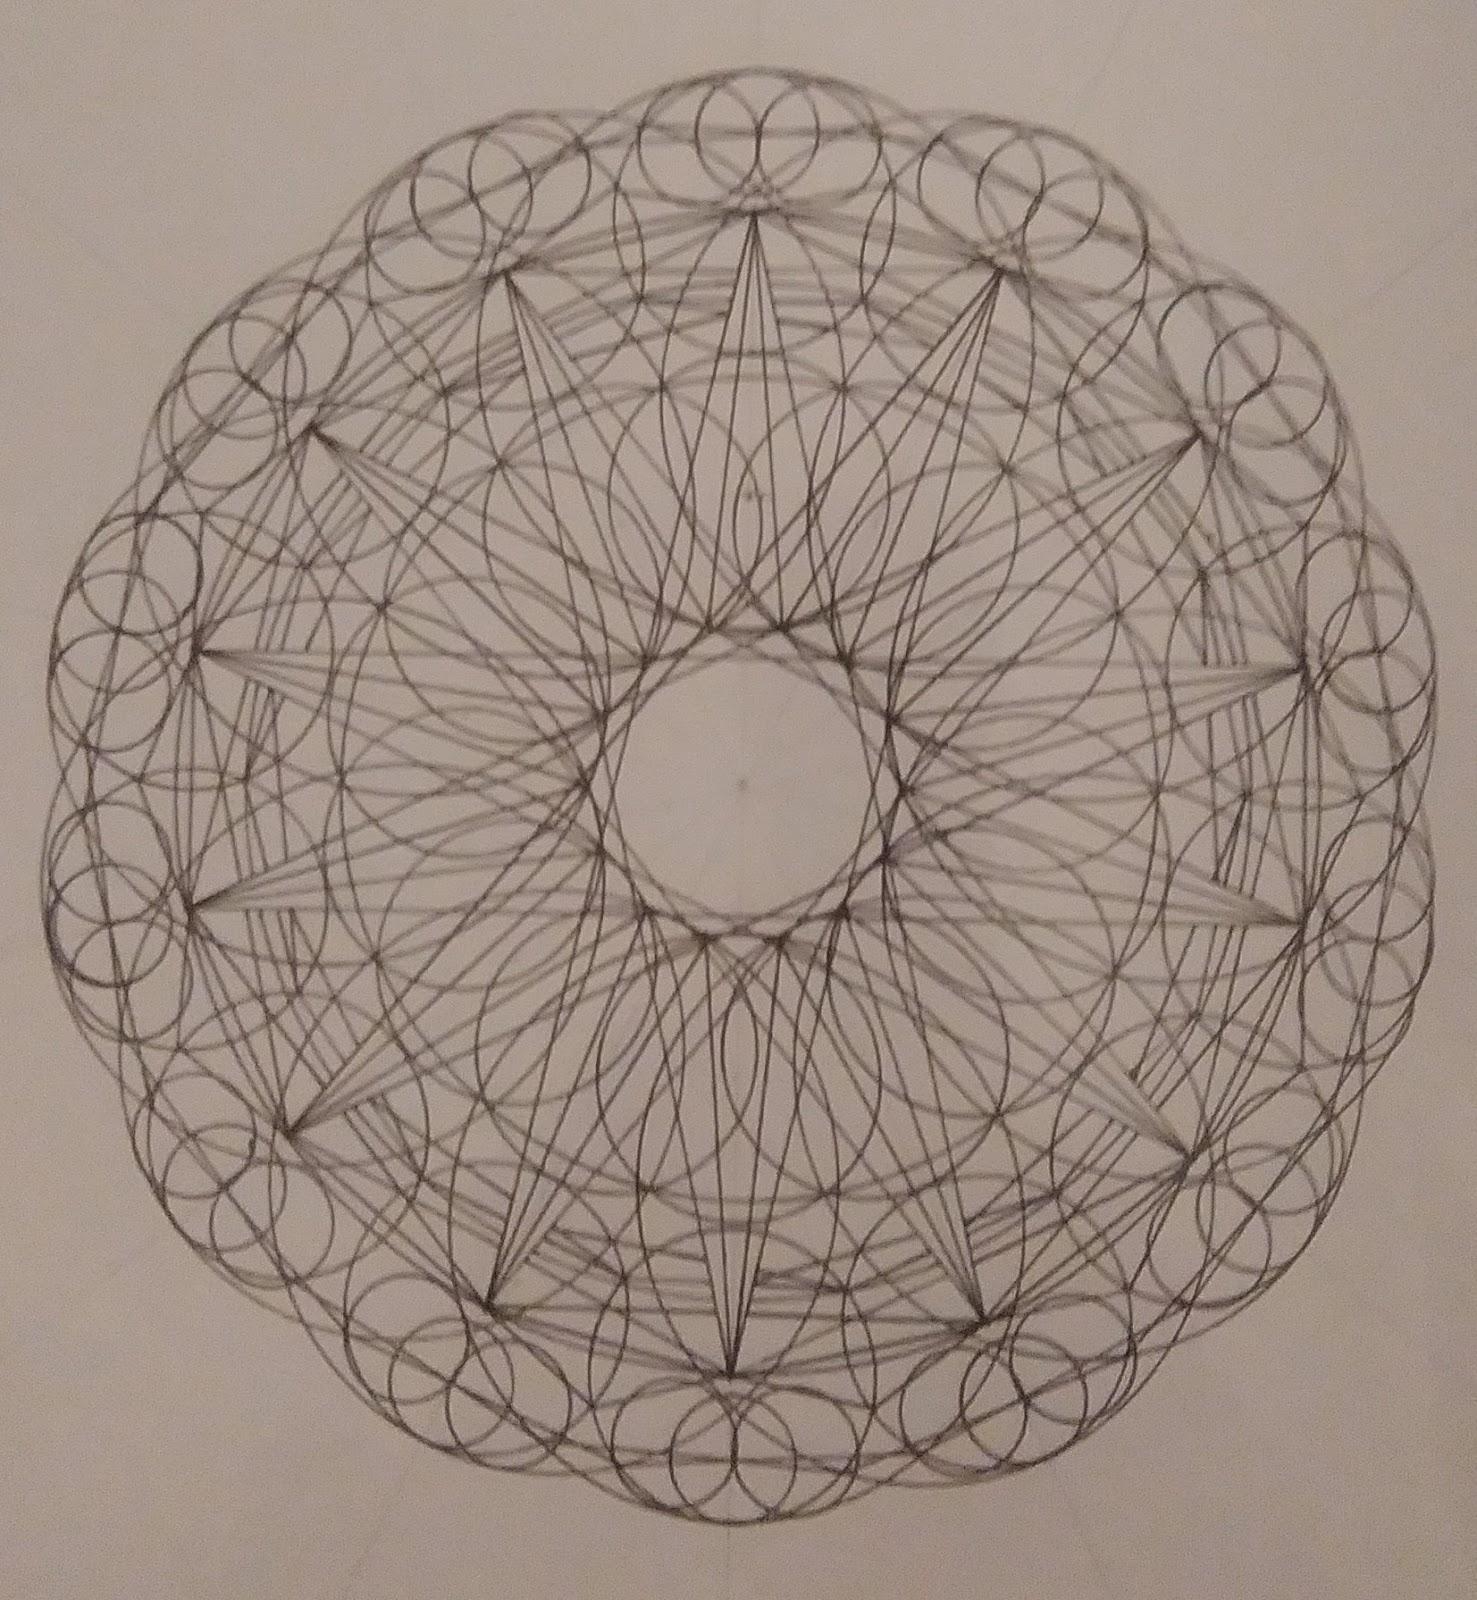 [SPOLYK] - Geometries & sketches - Page 6 48187071_1103195463200470_8483577243107328000_o